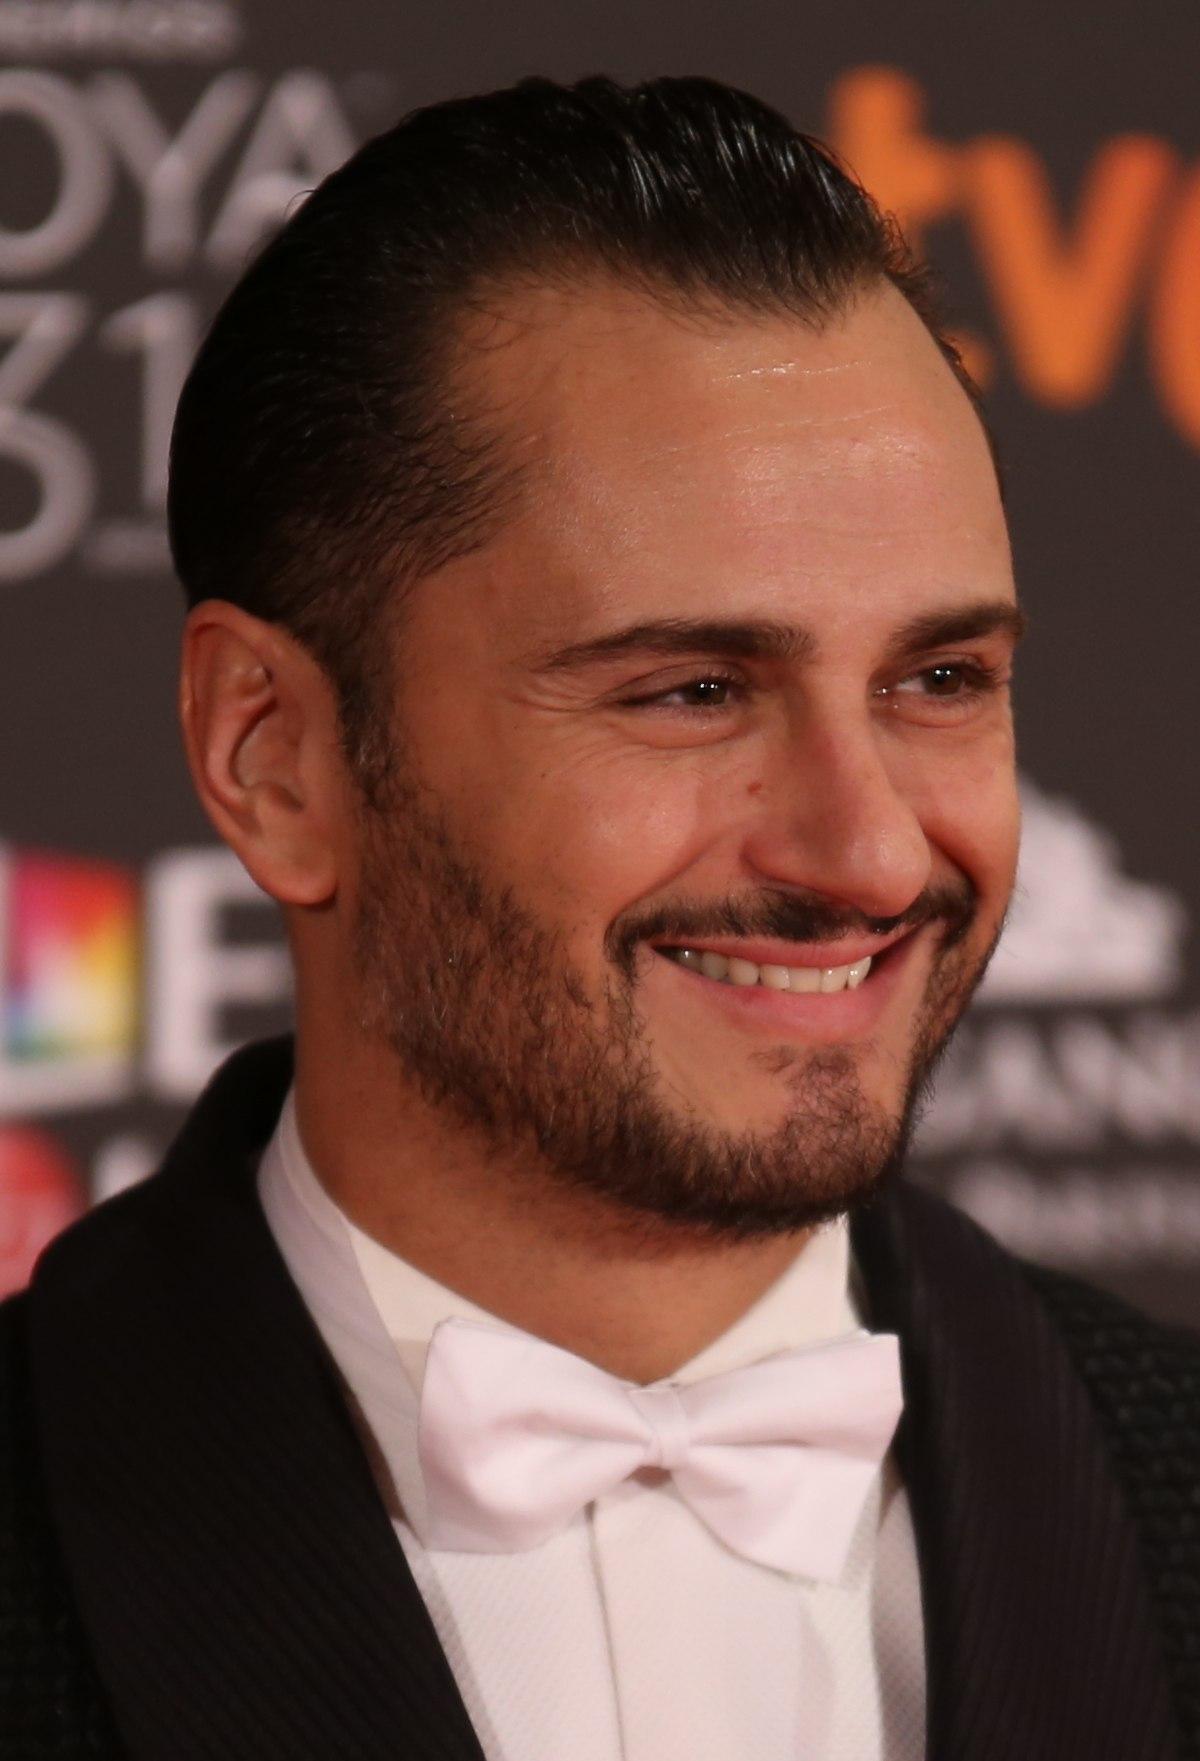 Asier Actor Porno Gay Español asier etxeandia - wikipedia